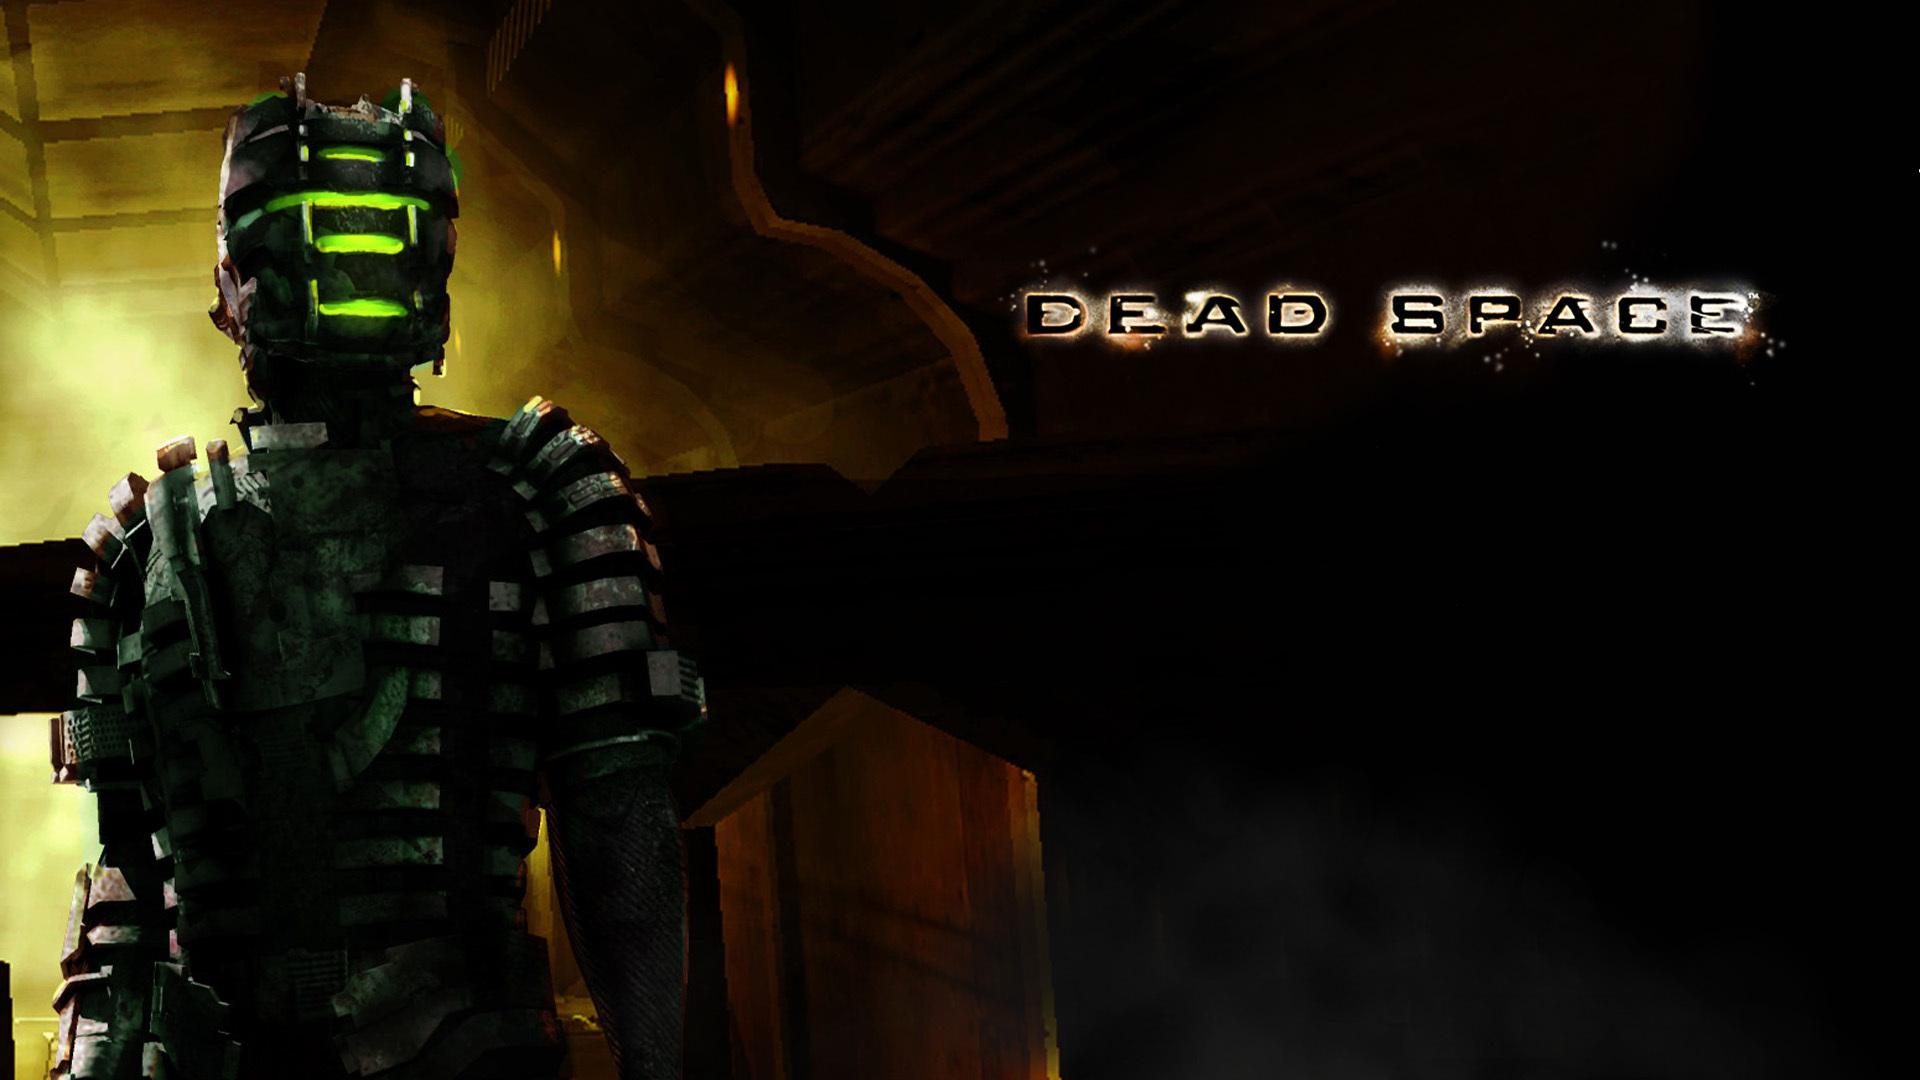 Dead Space Wallpaper - Dead Space 1 1080p , HD Wallpaper & Backgrounds